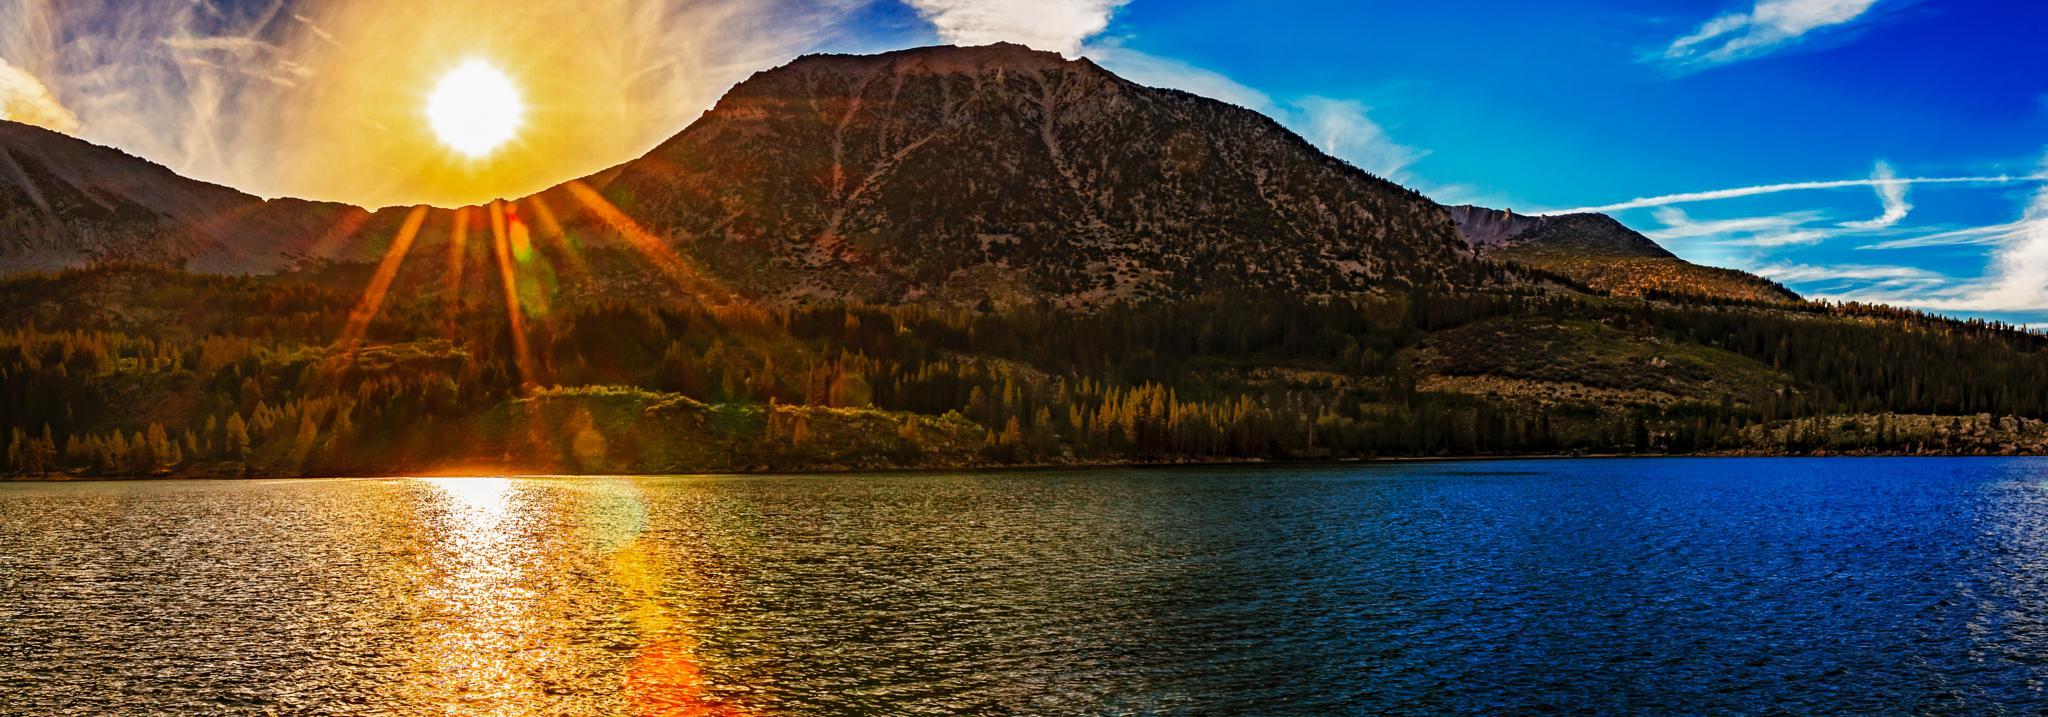 rock creek lake sunset by hugh.mobley.946